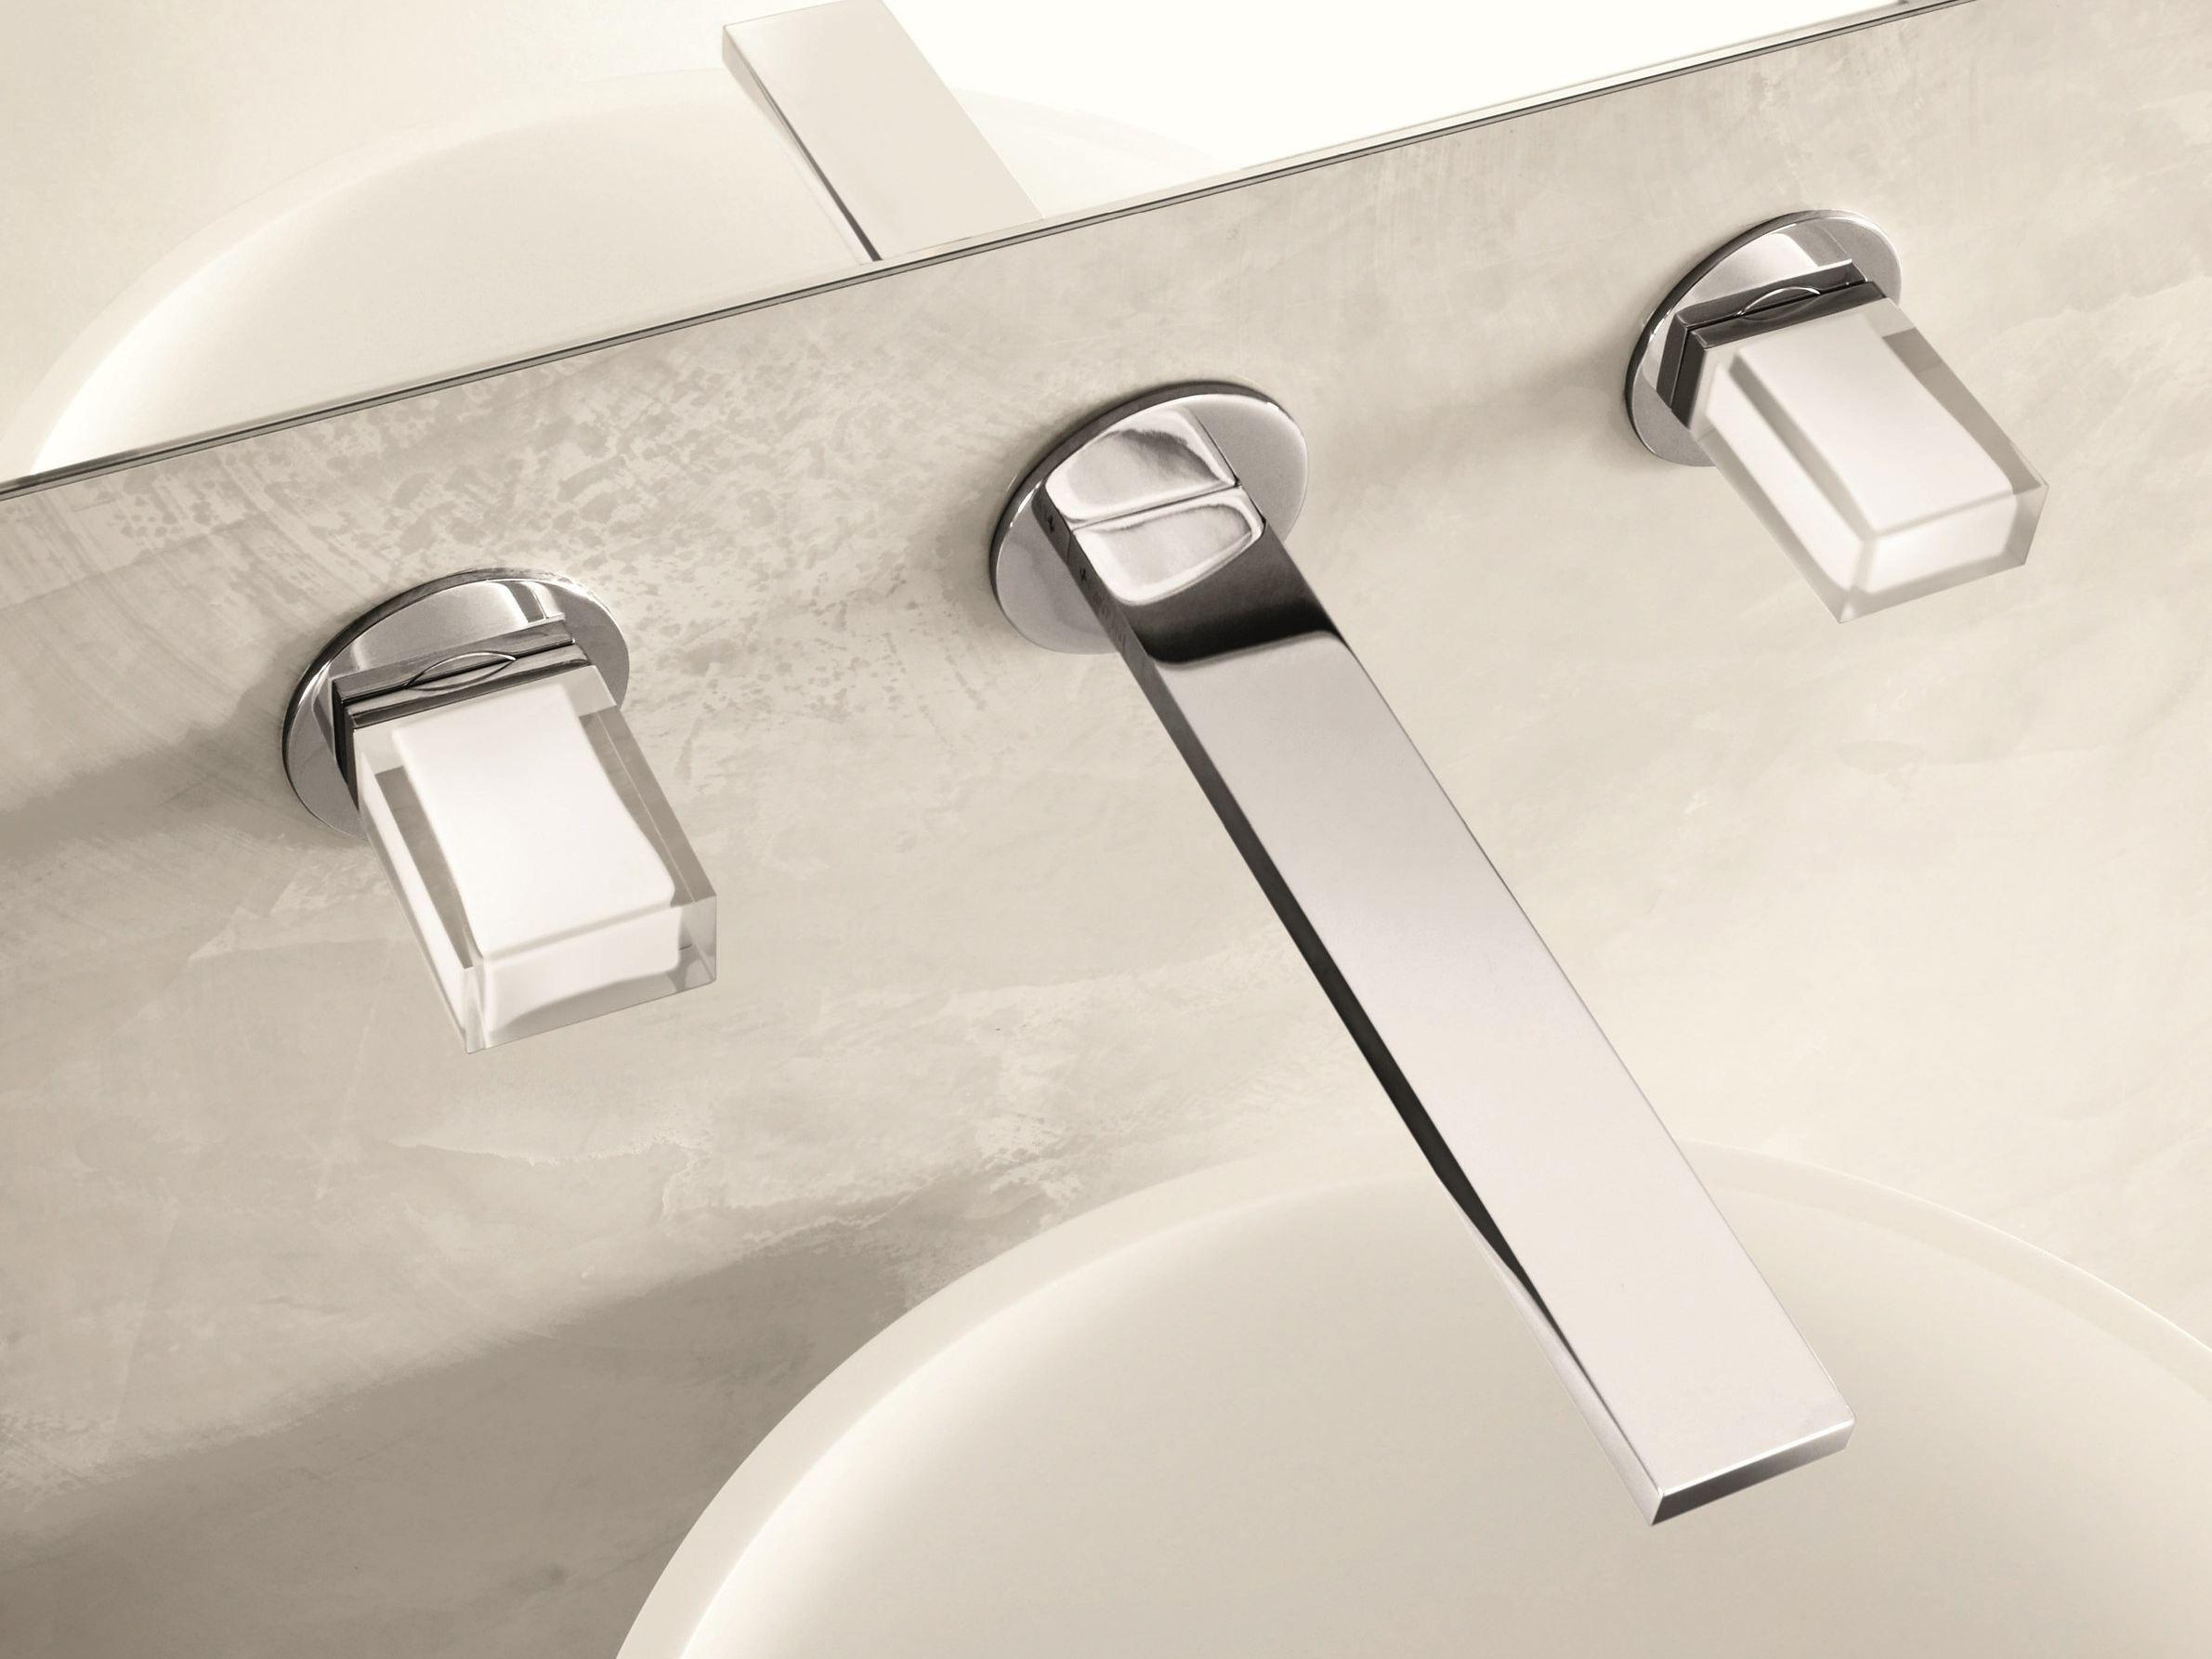 Venezia in robinet pour lavabo mural by fantini rubinetti for Robinet mural pour lavabo